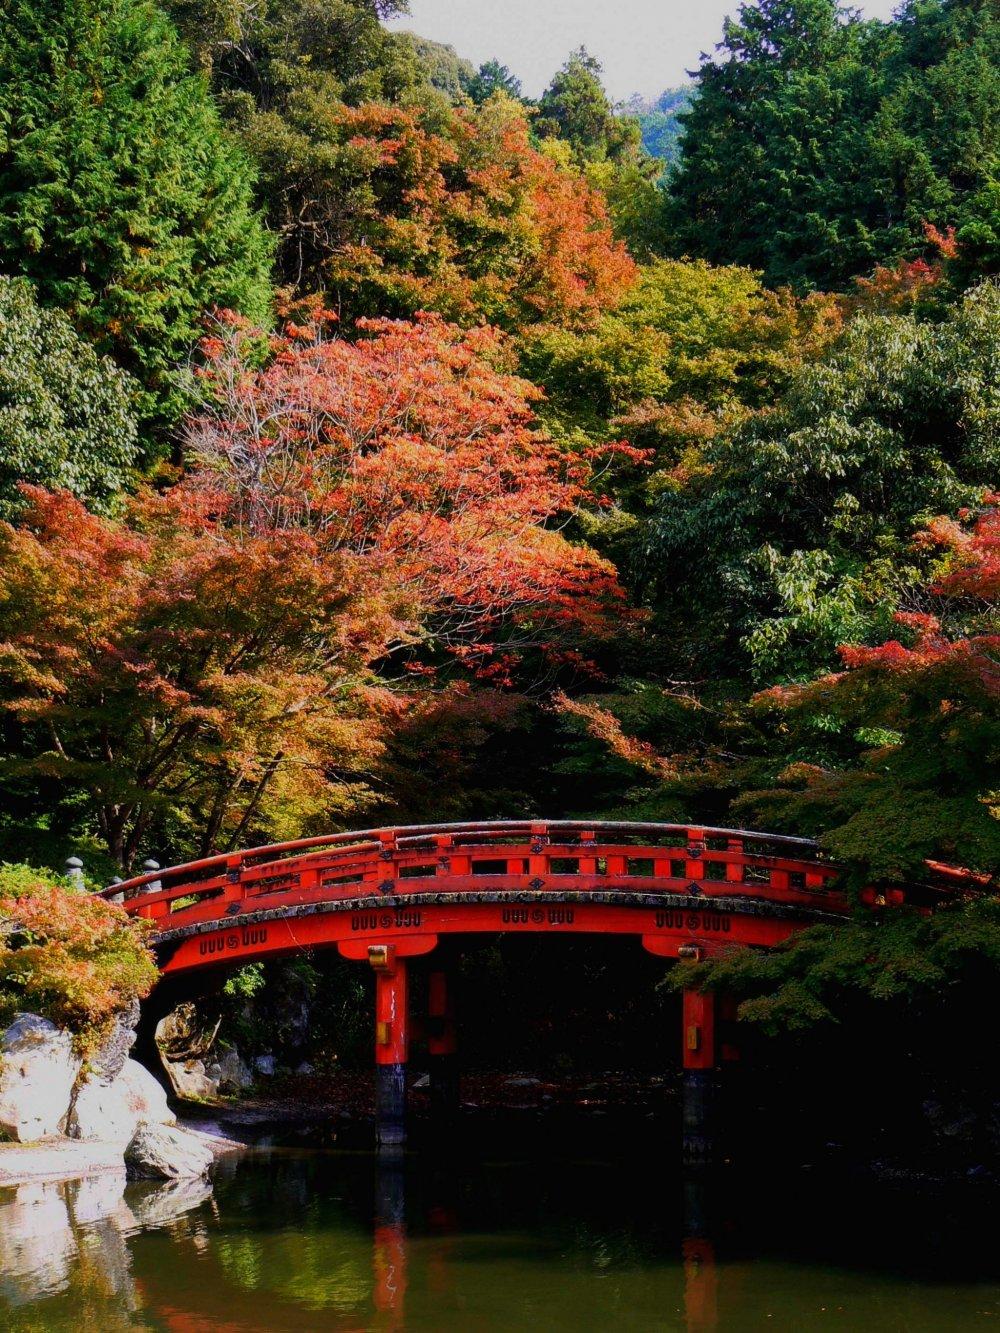 Autumn foliage creates a wonderful background for the bridge